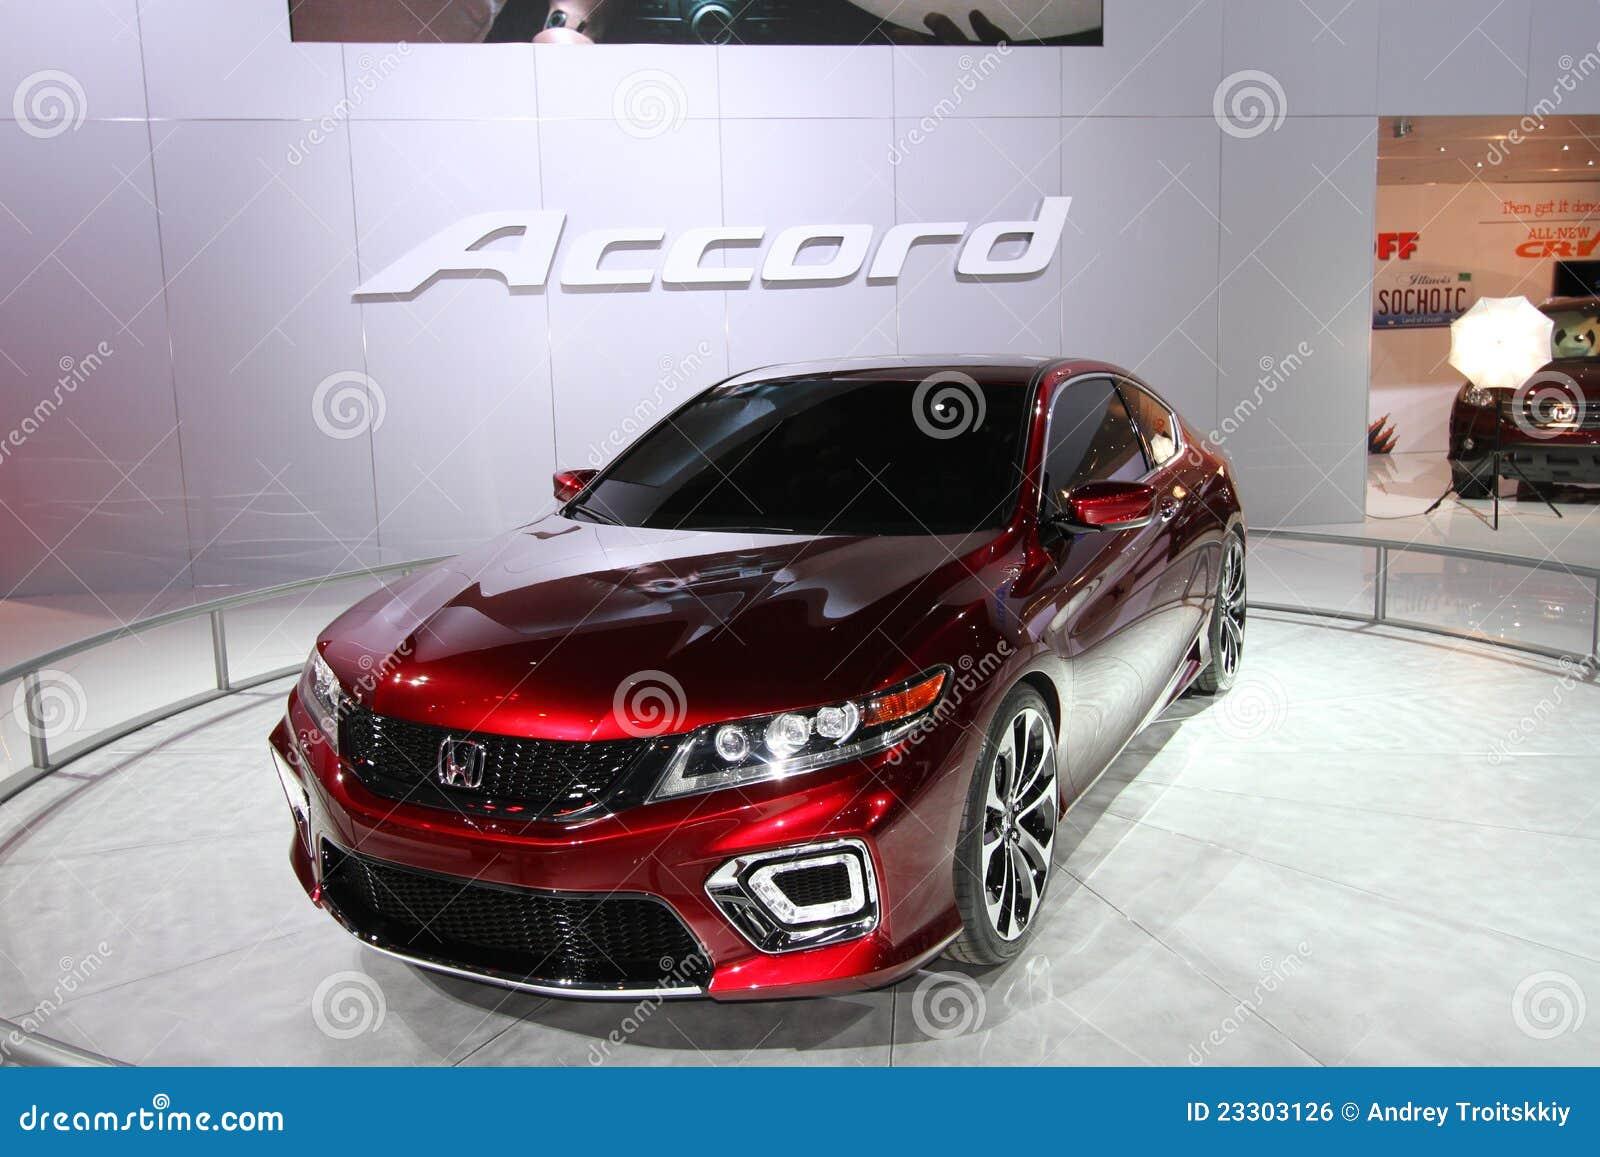 2013 New Honda Accord